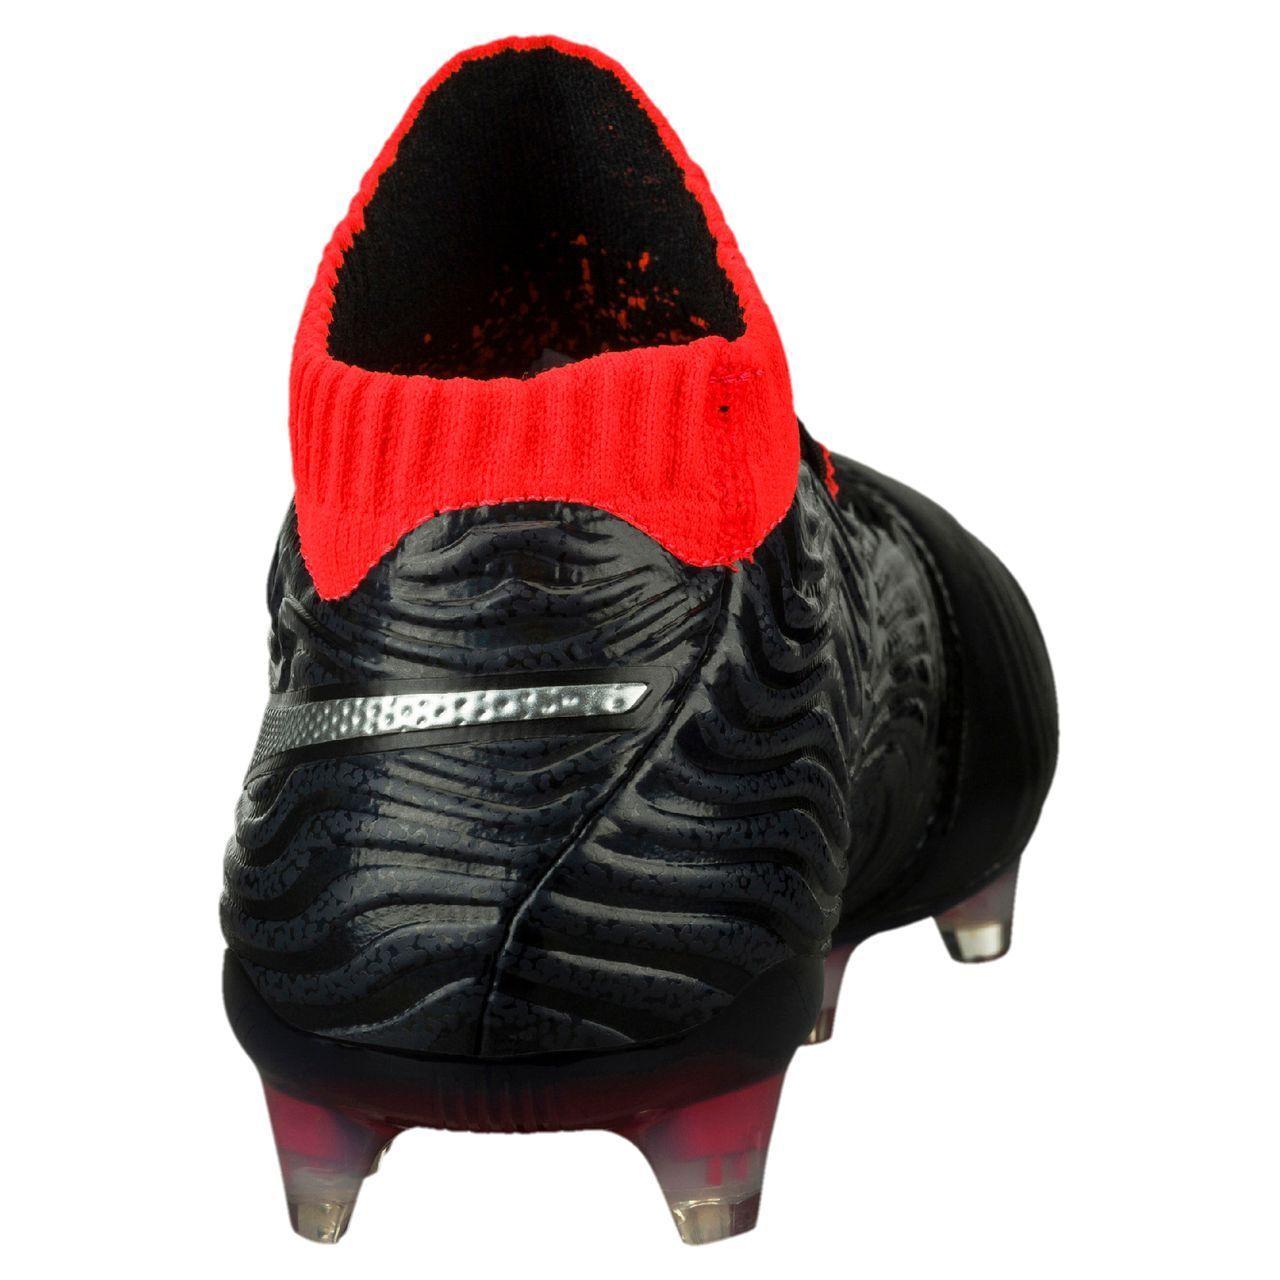 Puma Herren Fußballschuhe One One One 18.1 FG Fußball Leder 104527 01 64a19c